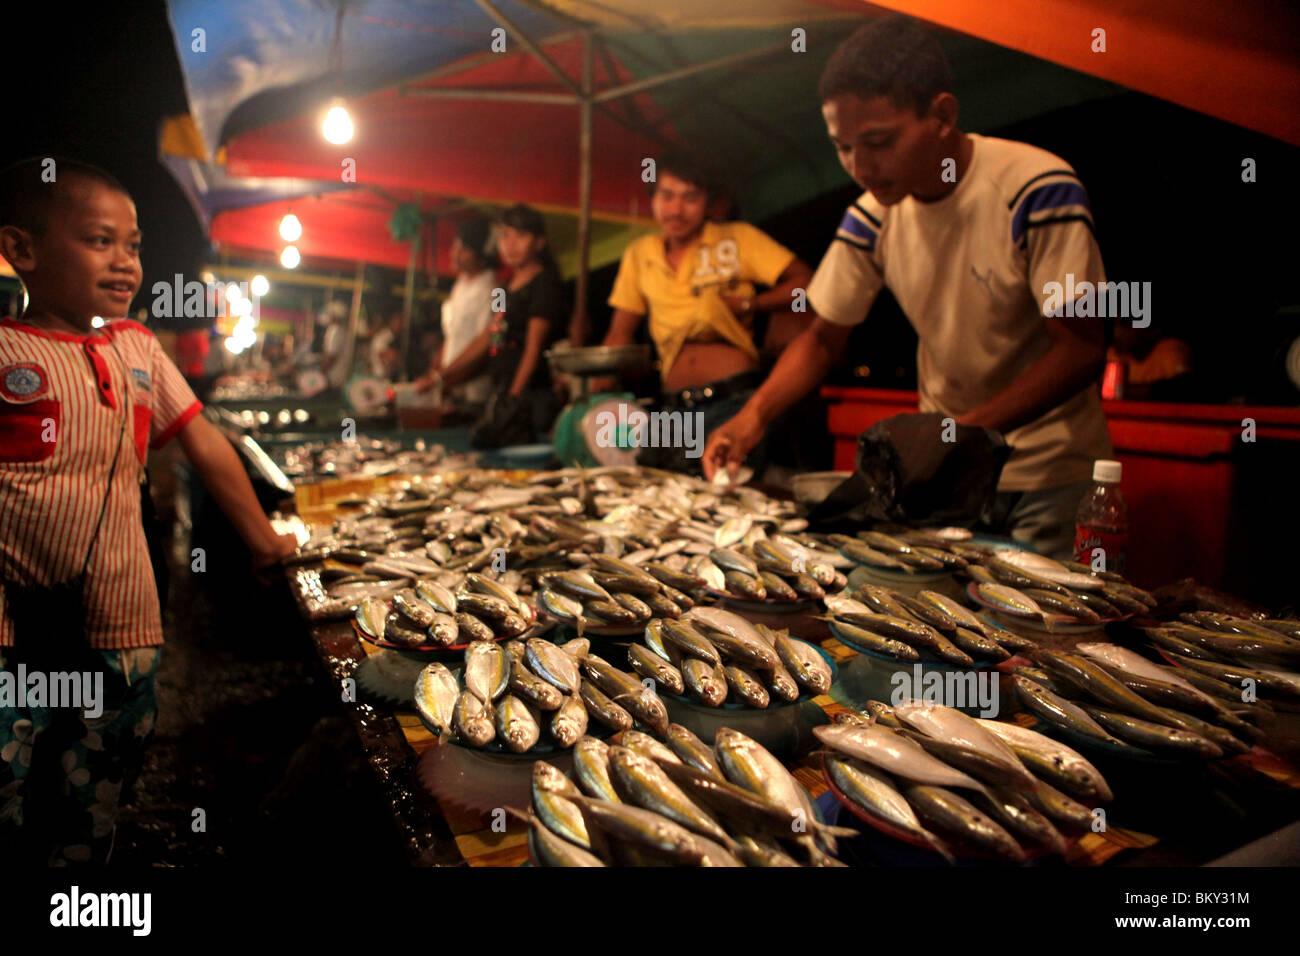 Fresh fish on display at the night market in Kota Kinabalu, Sabah state, Borneo in Malaysia. - Stock Image